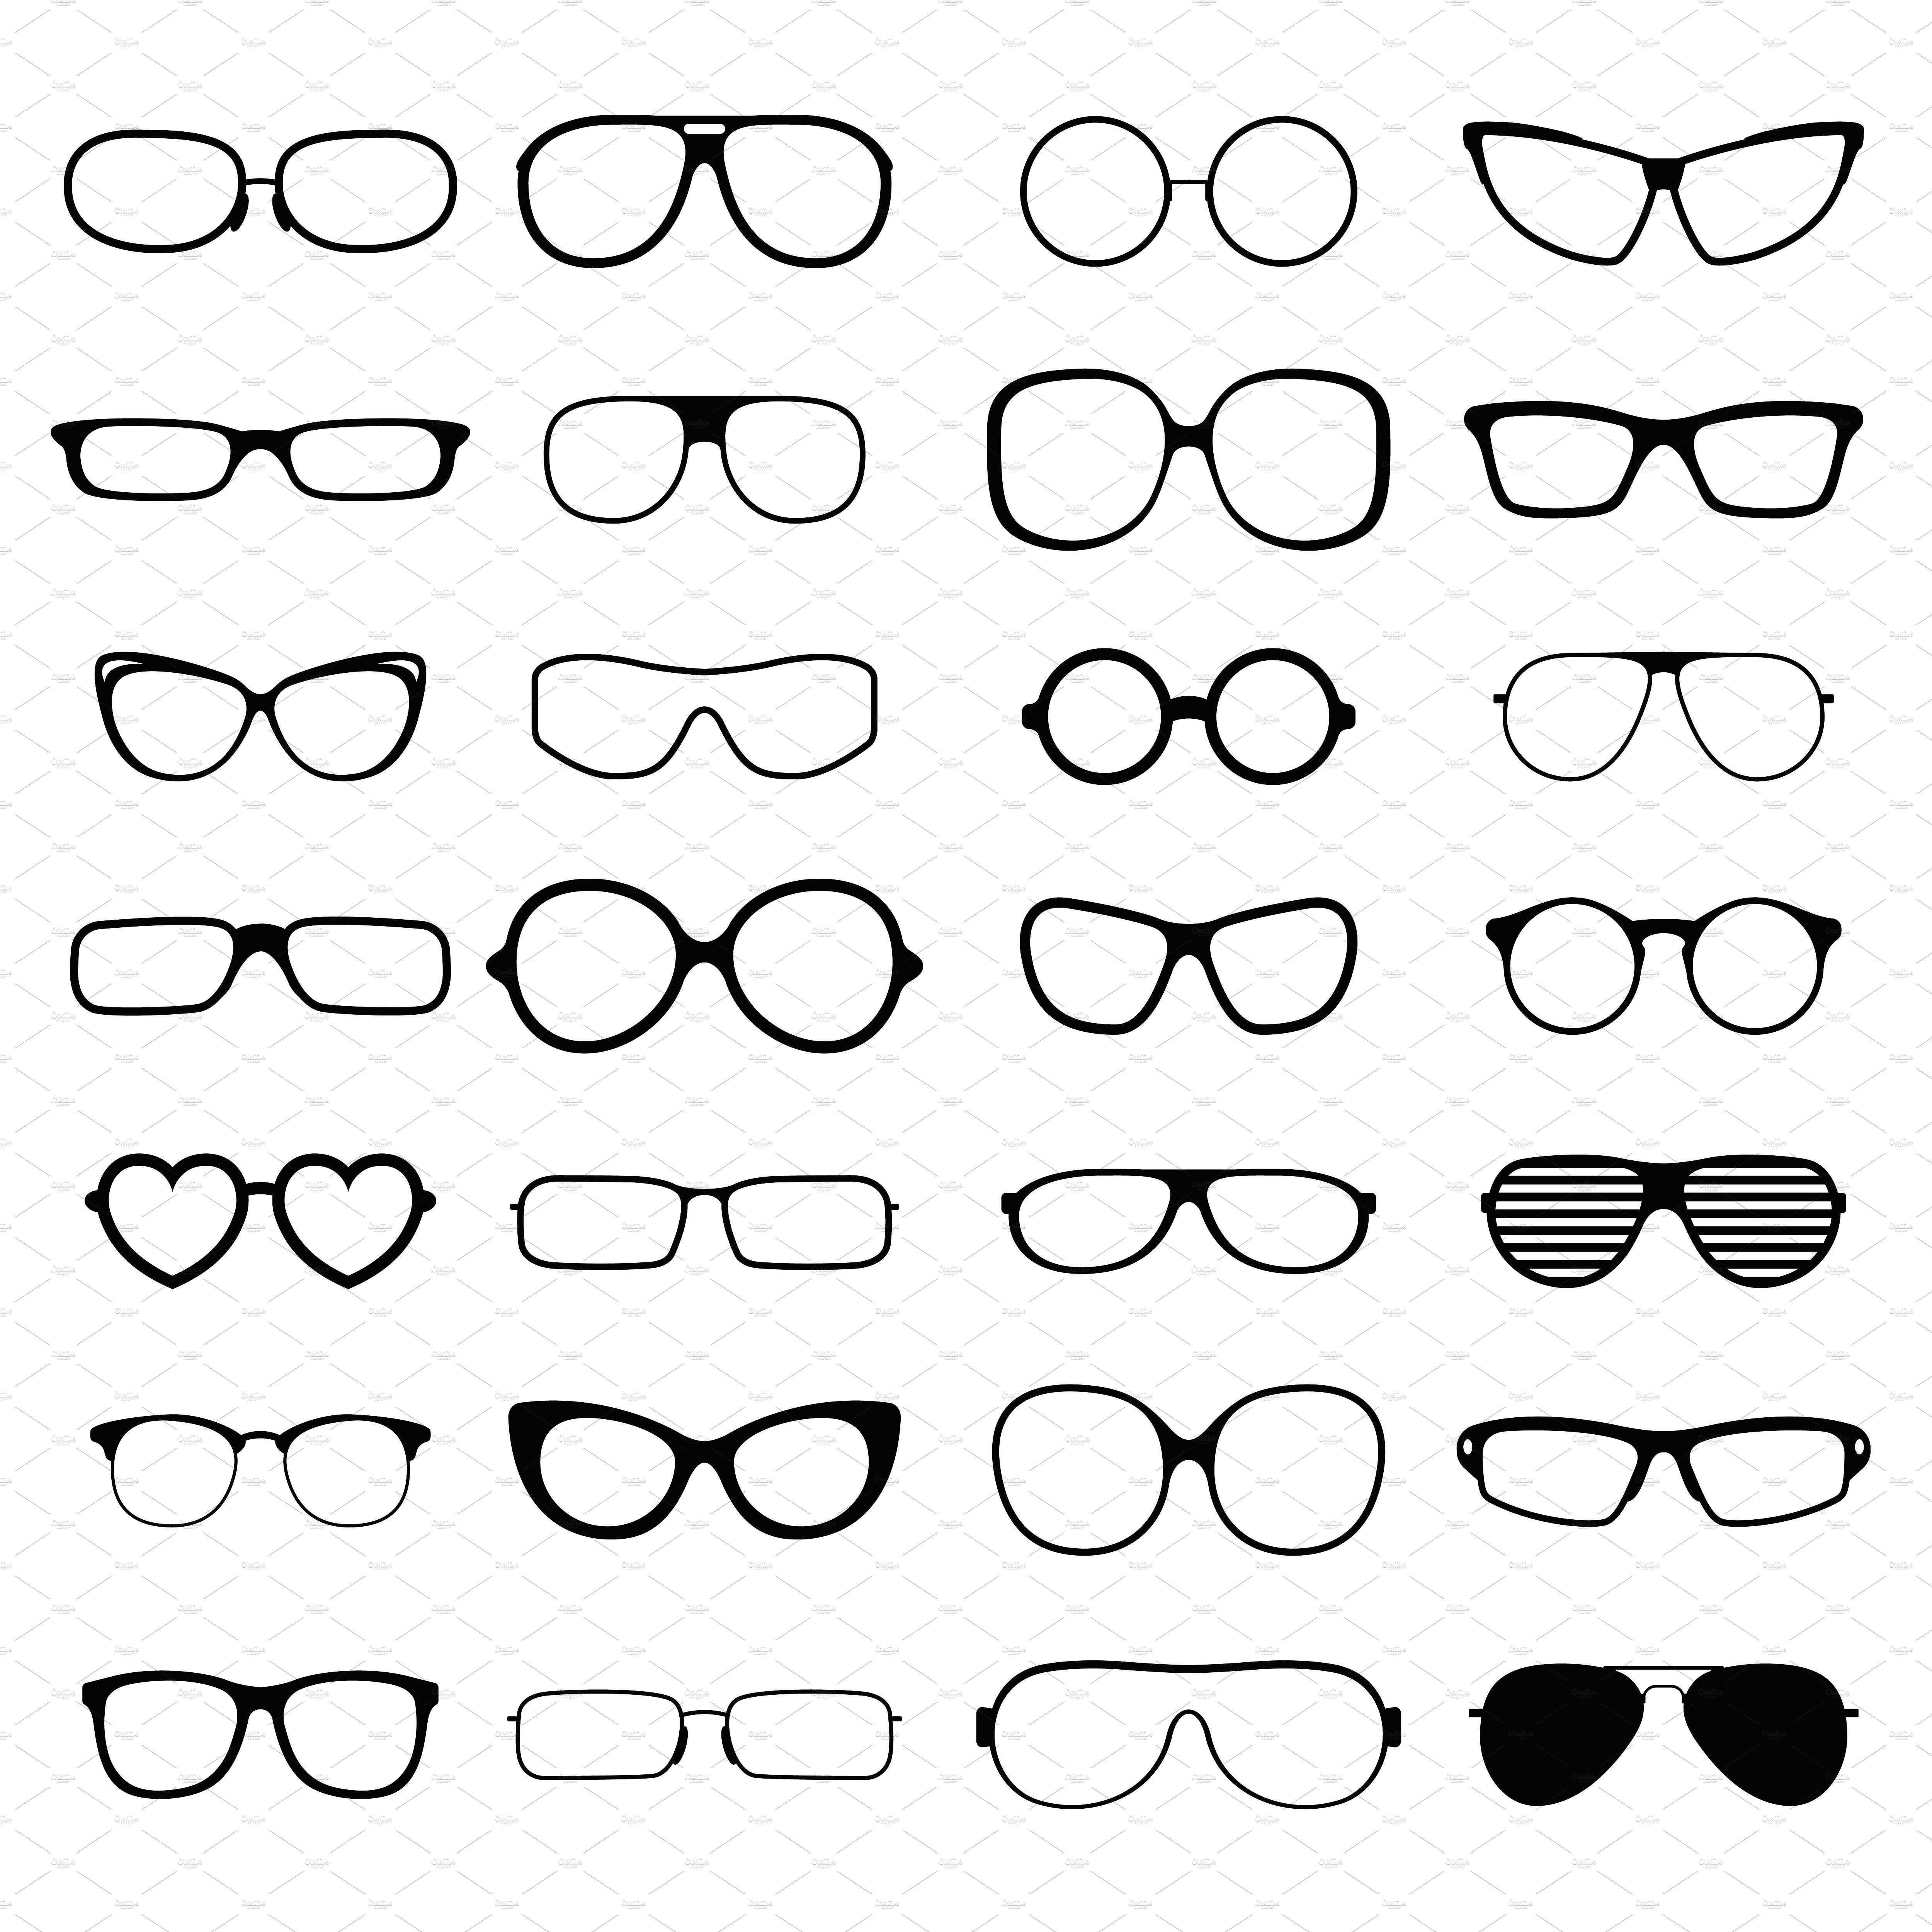 ca454d3812b Black fashion glasses silhouette by Vectorstockersland on  creativemarket